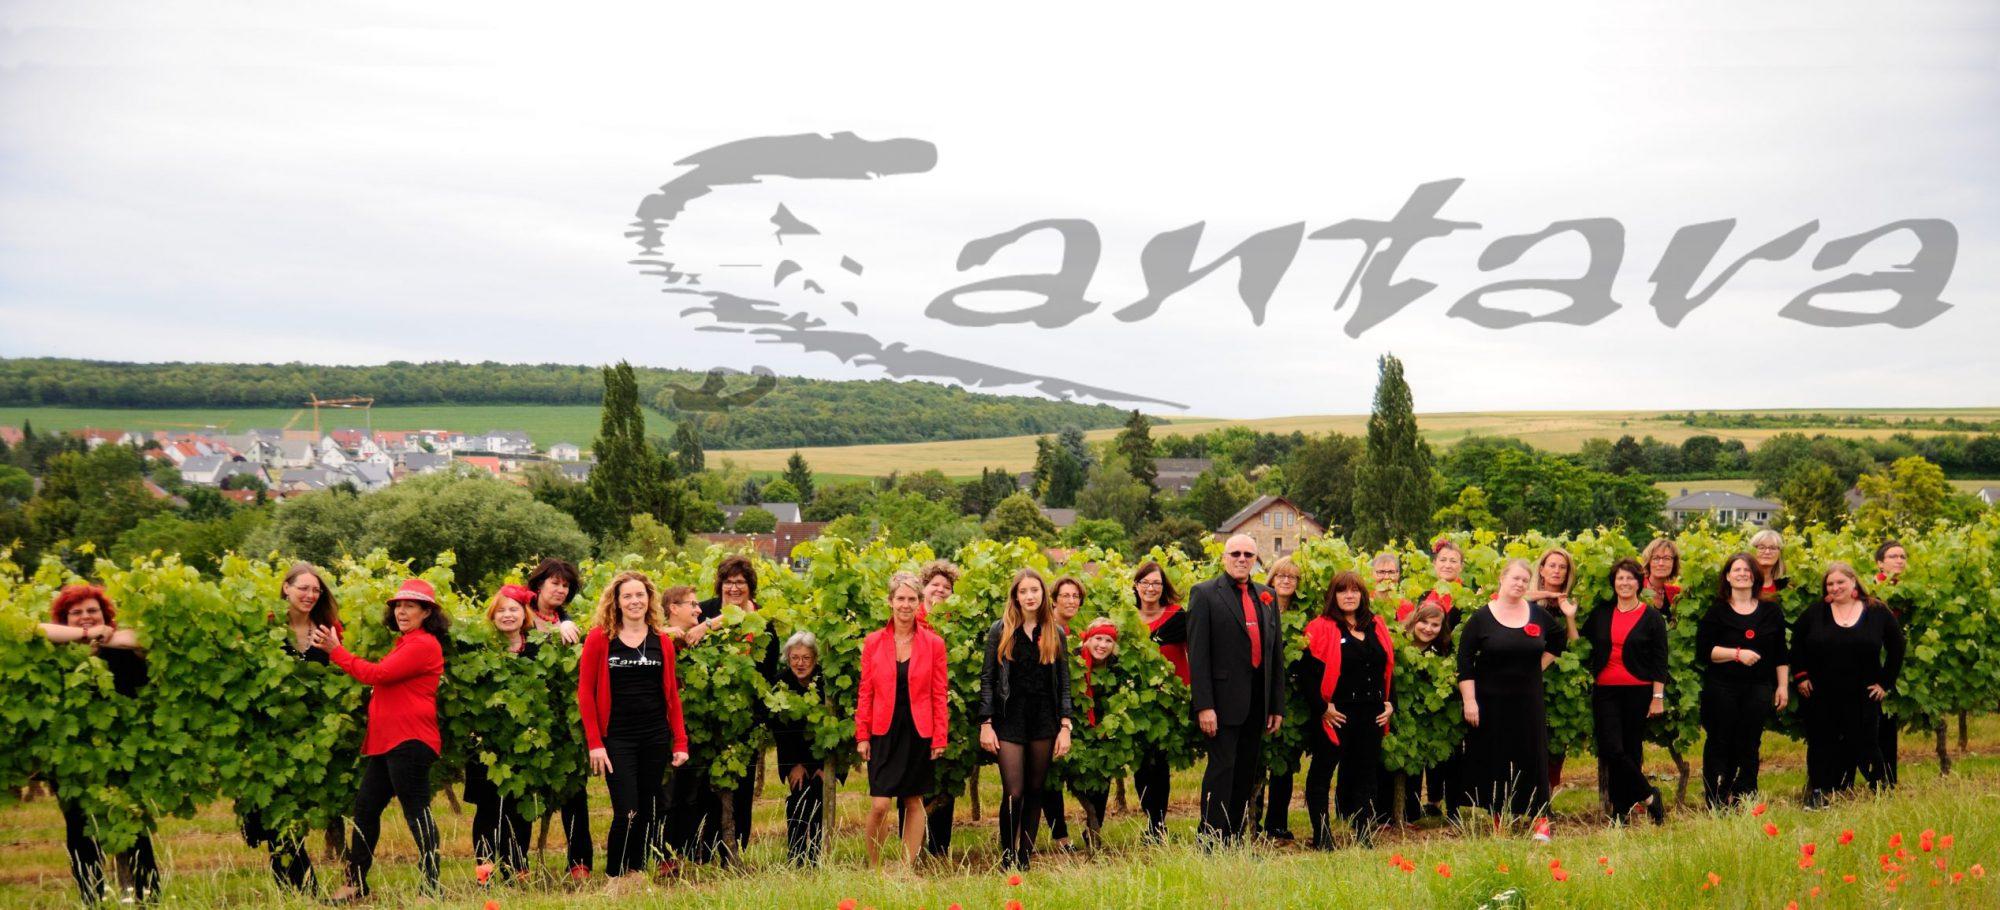 Frauenchor Cantara Albig